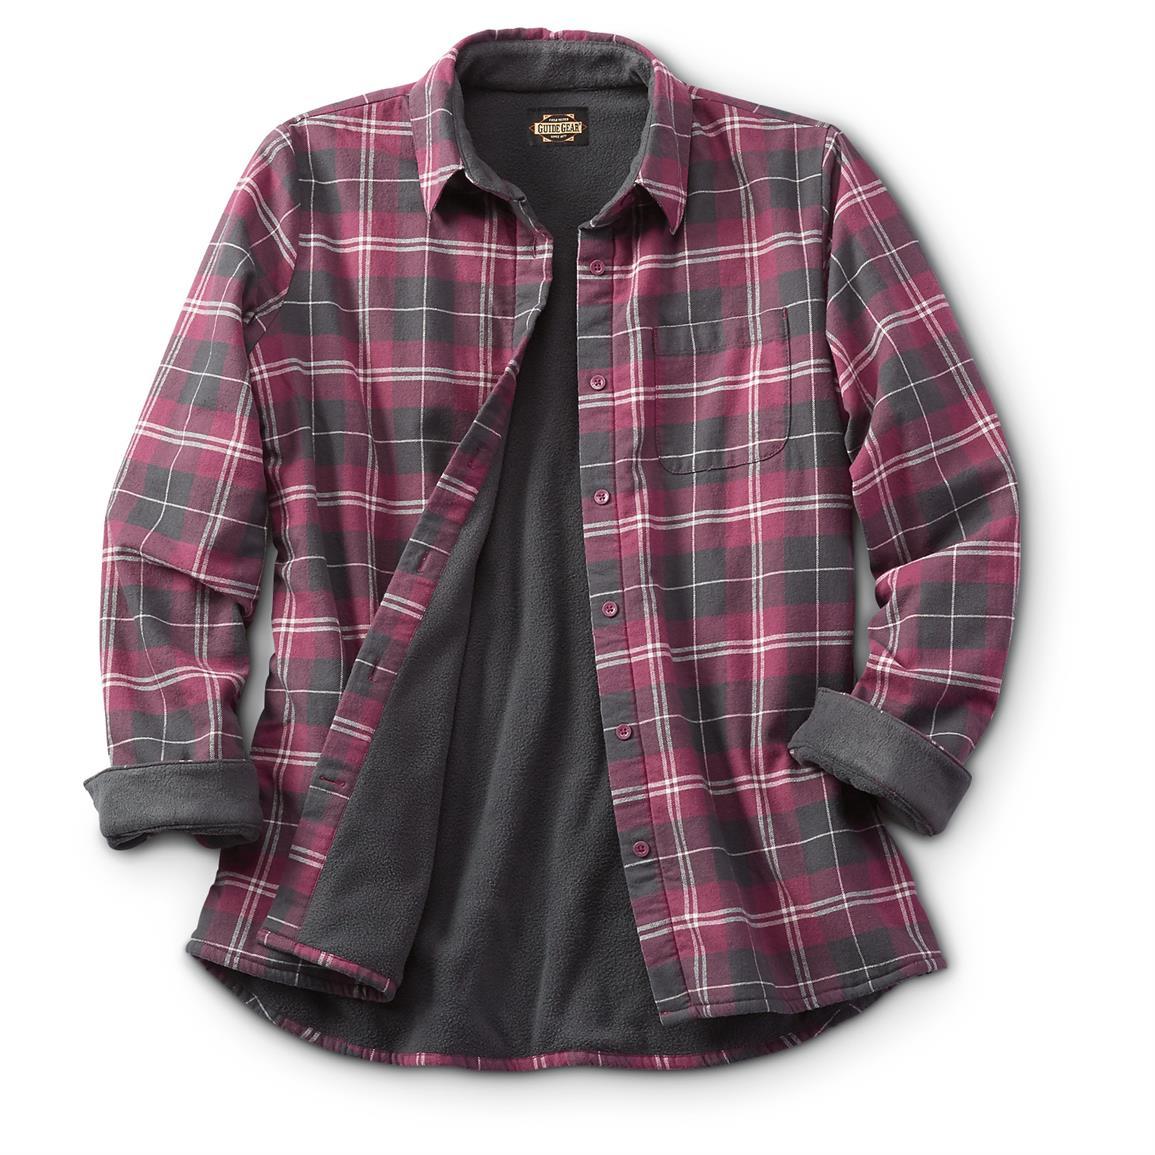 flannel shirts guide gear womenu0027s fleece-lined flannel shirt, wine ldqtwnl